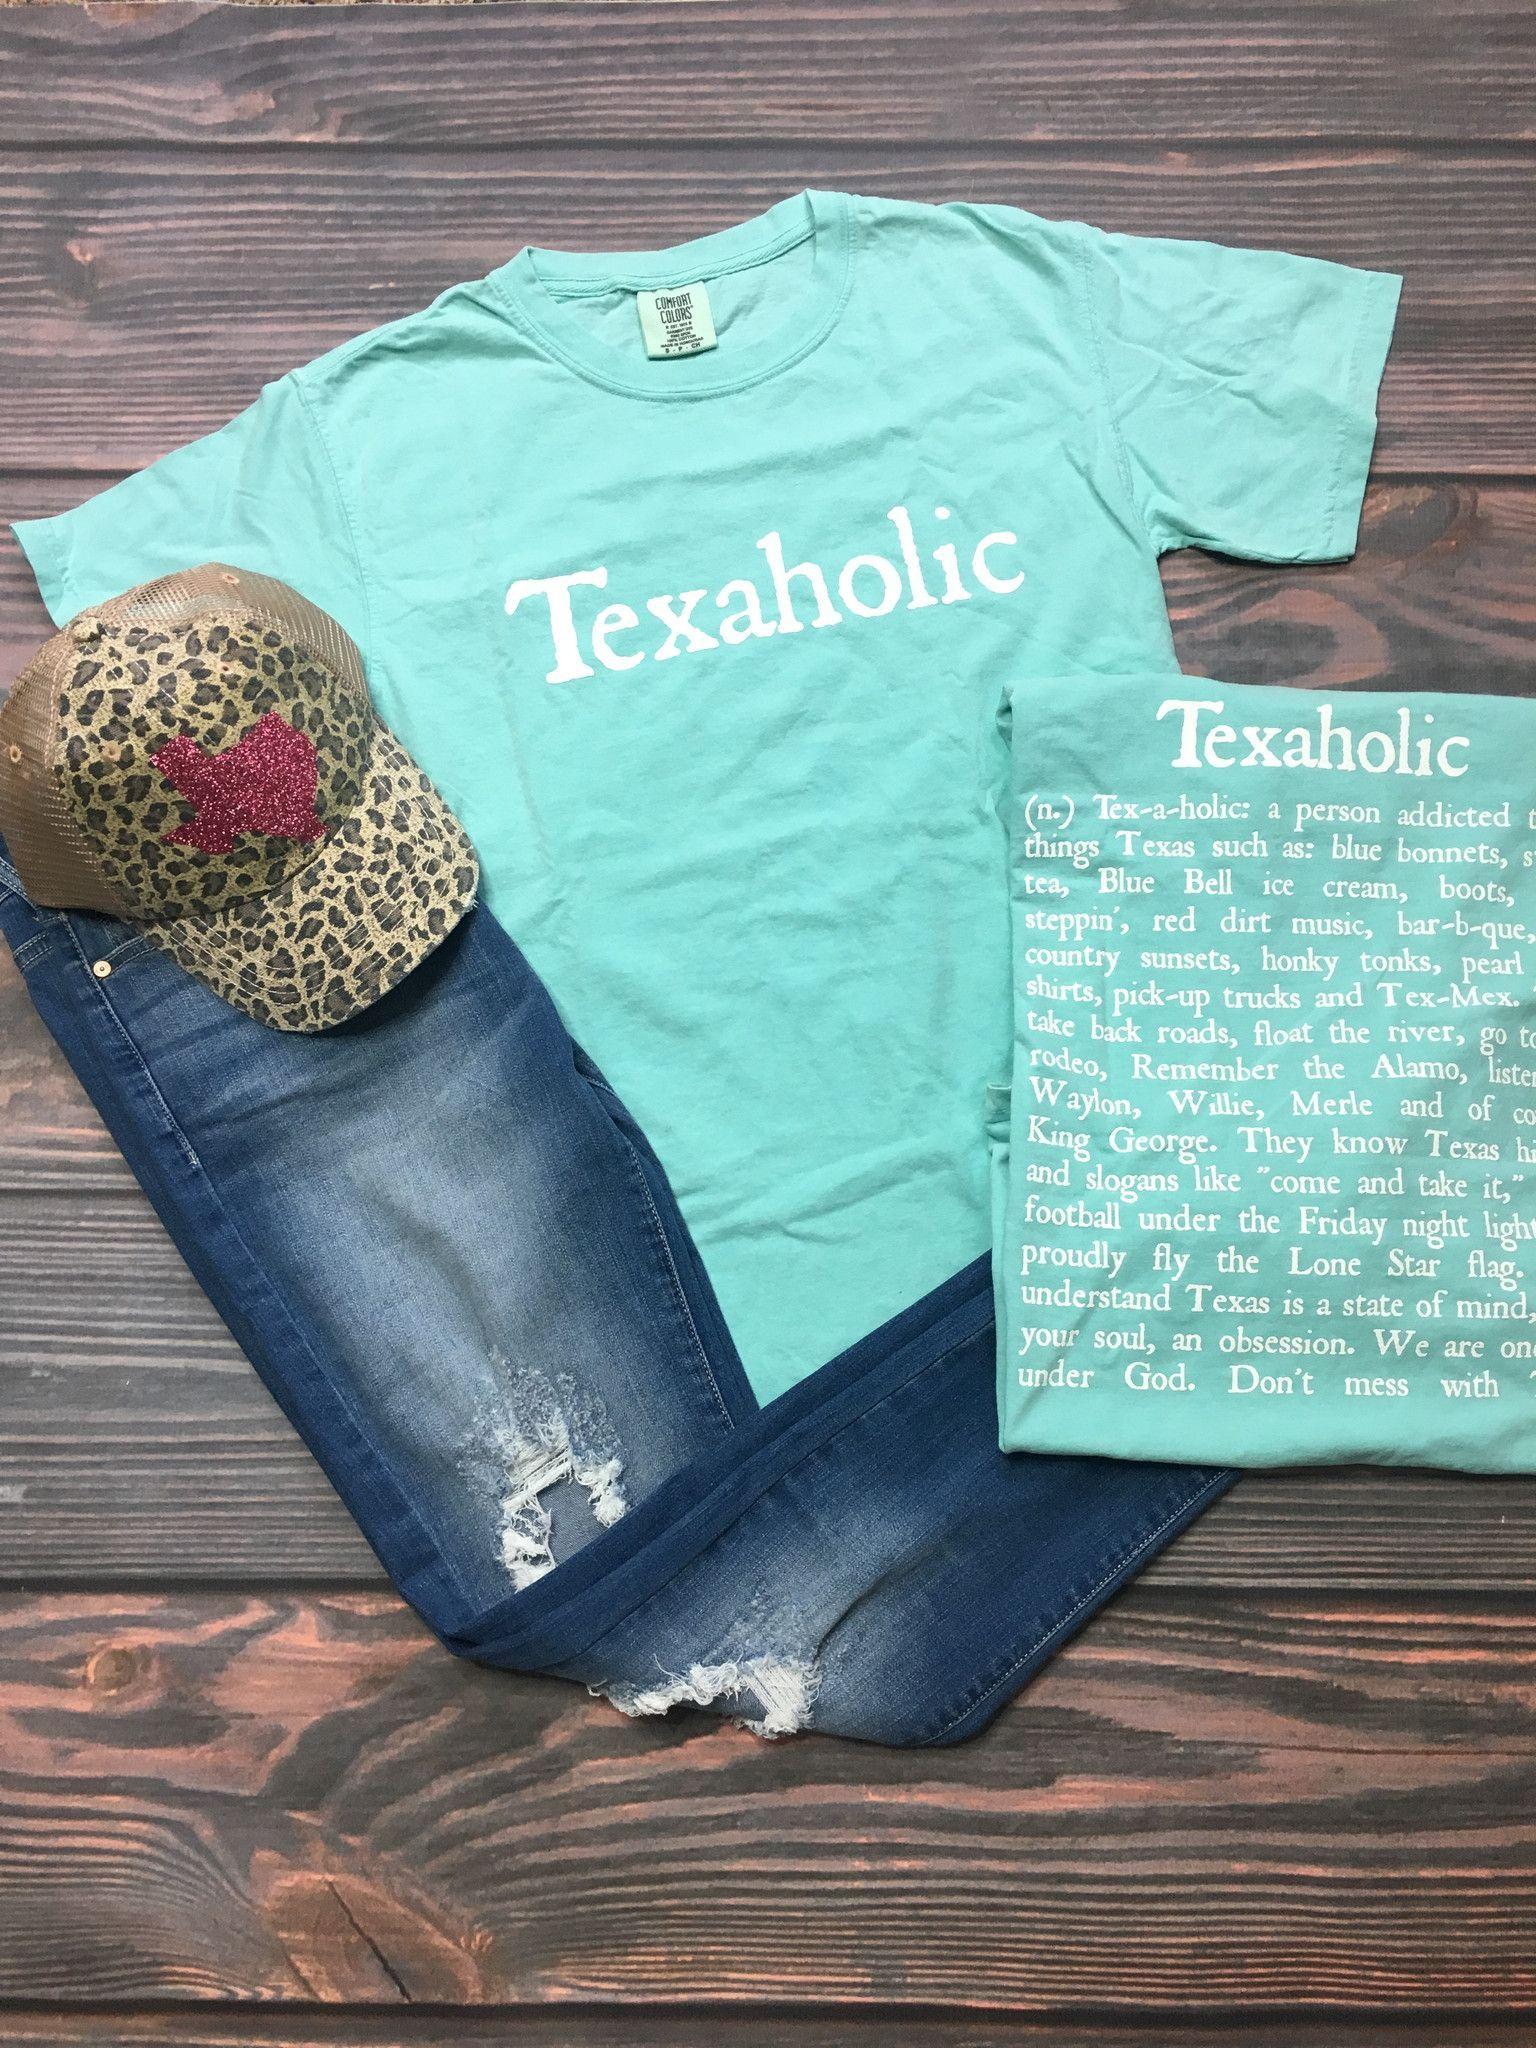 42a5c802 Texaholic Texas Tee in Mint (S-XL) | Tops in 2019 | Tees, T shirts ...